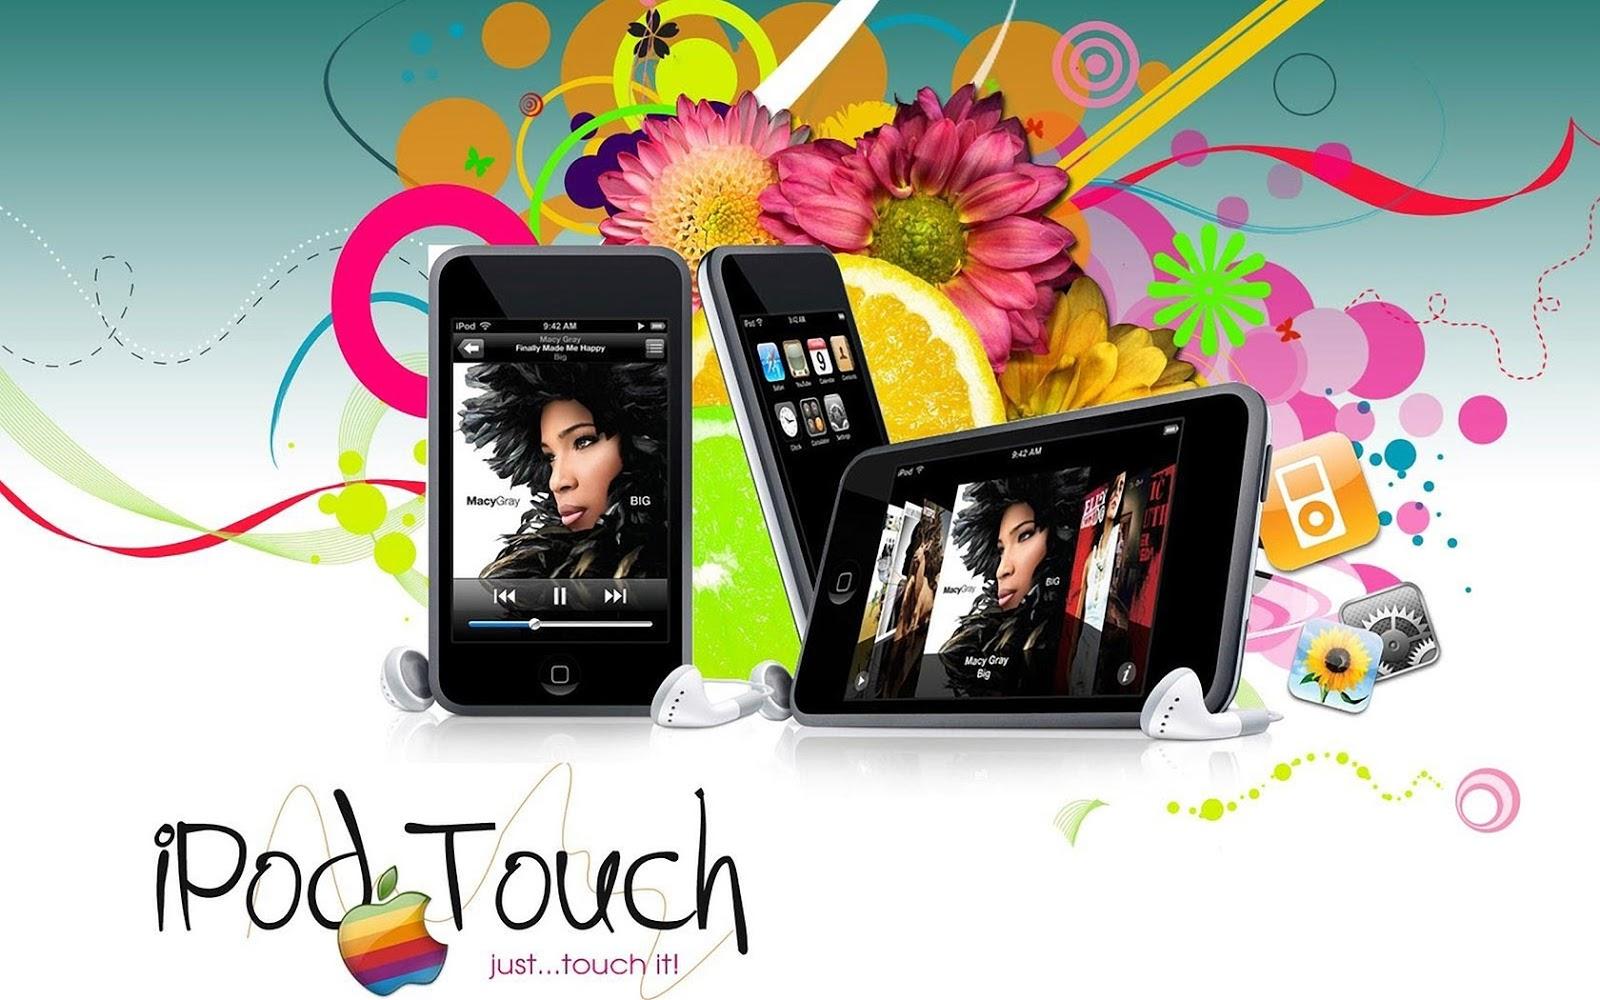 http://4.bp.blogspot.com/-socbZIjpa04/UNWdvXSC0nI/AAAAAAAAJgs/xj4Pb5So7J8/s1600/apple-ipod-touch-achtergrond-met-gekleurde-bloemen-lijnen-en-cirkels.jpg